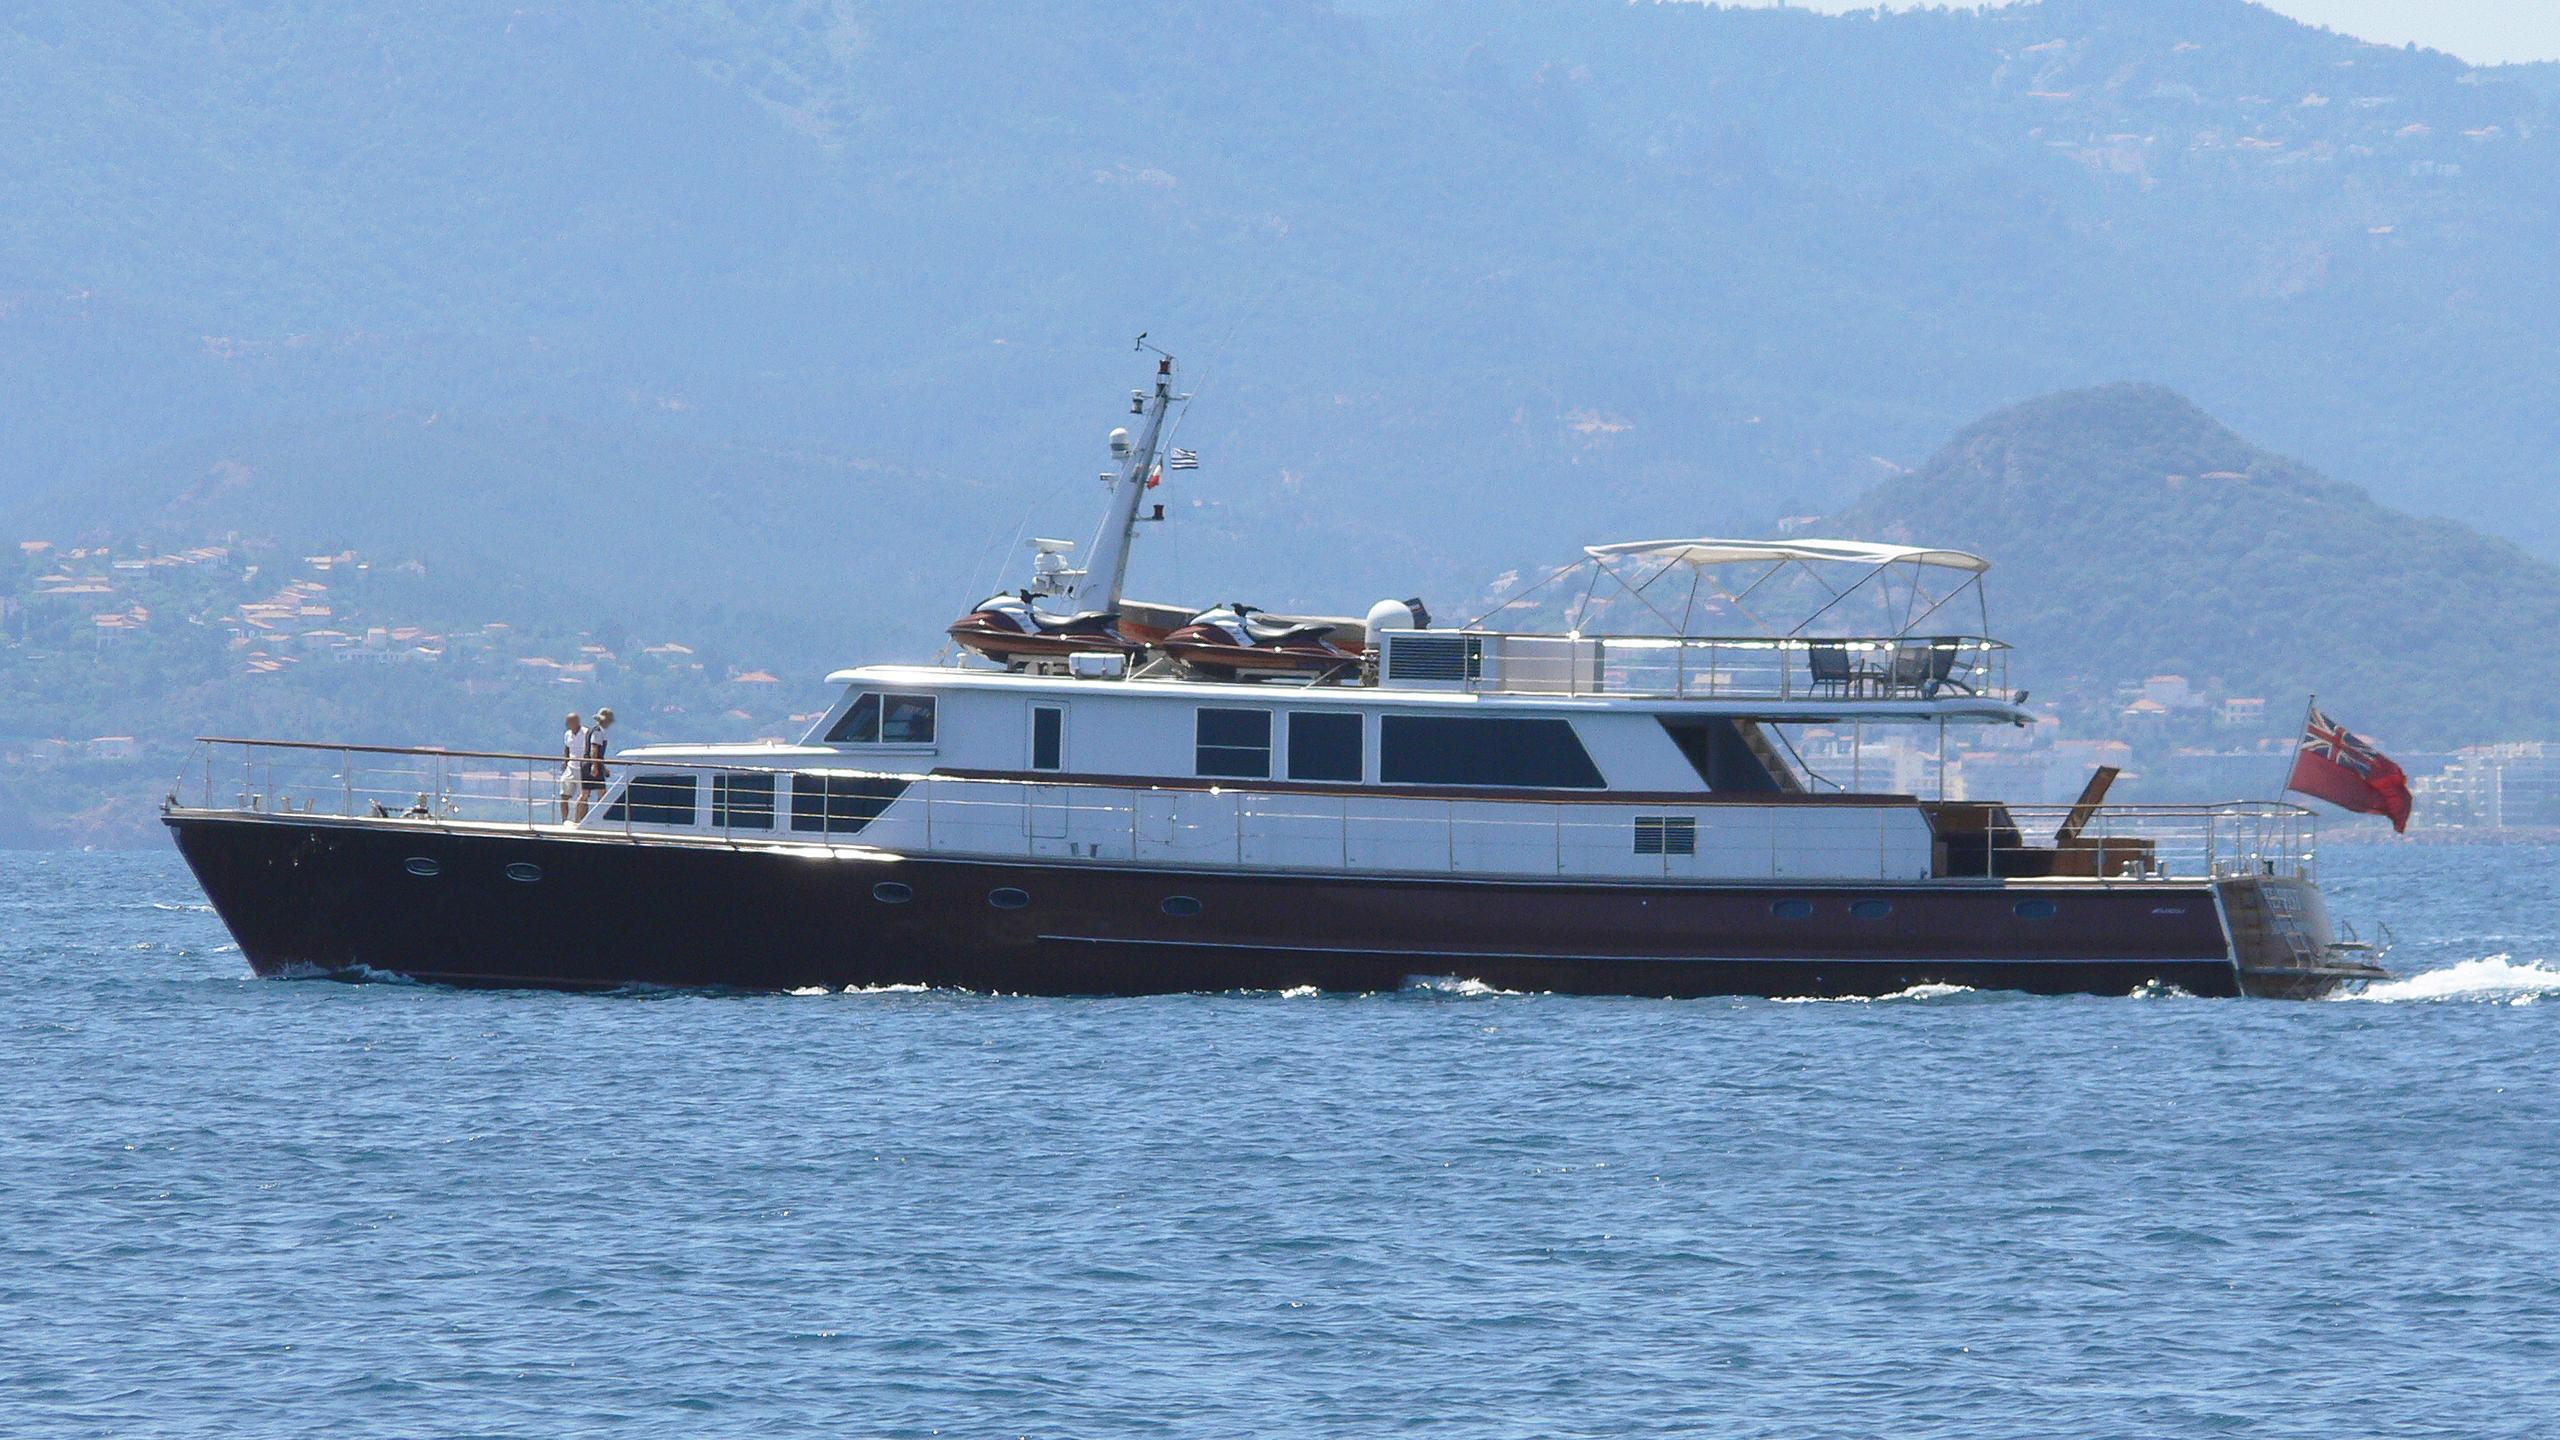 tempest-ws-motor-yacht-esterel-1963-32m-profile